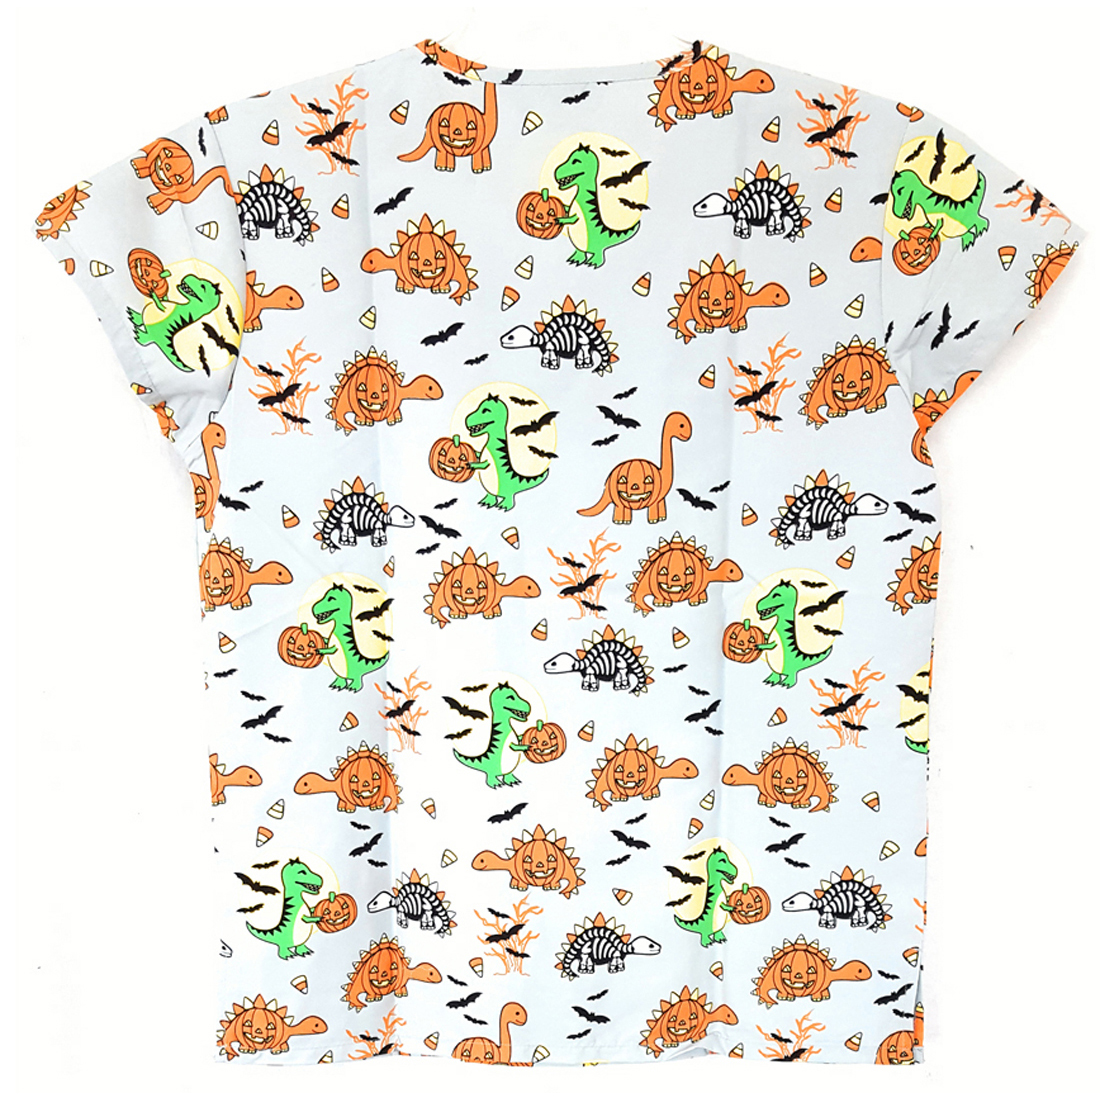 V-Neck-Halloween-Print-Scrub-Top-Microfiber-Medical-Uniform-Shirt-DSF-Uniforms miniature 12